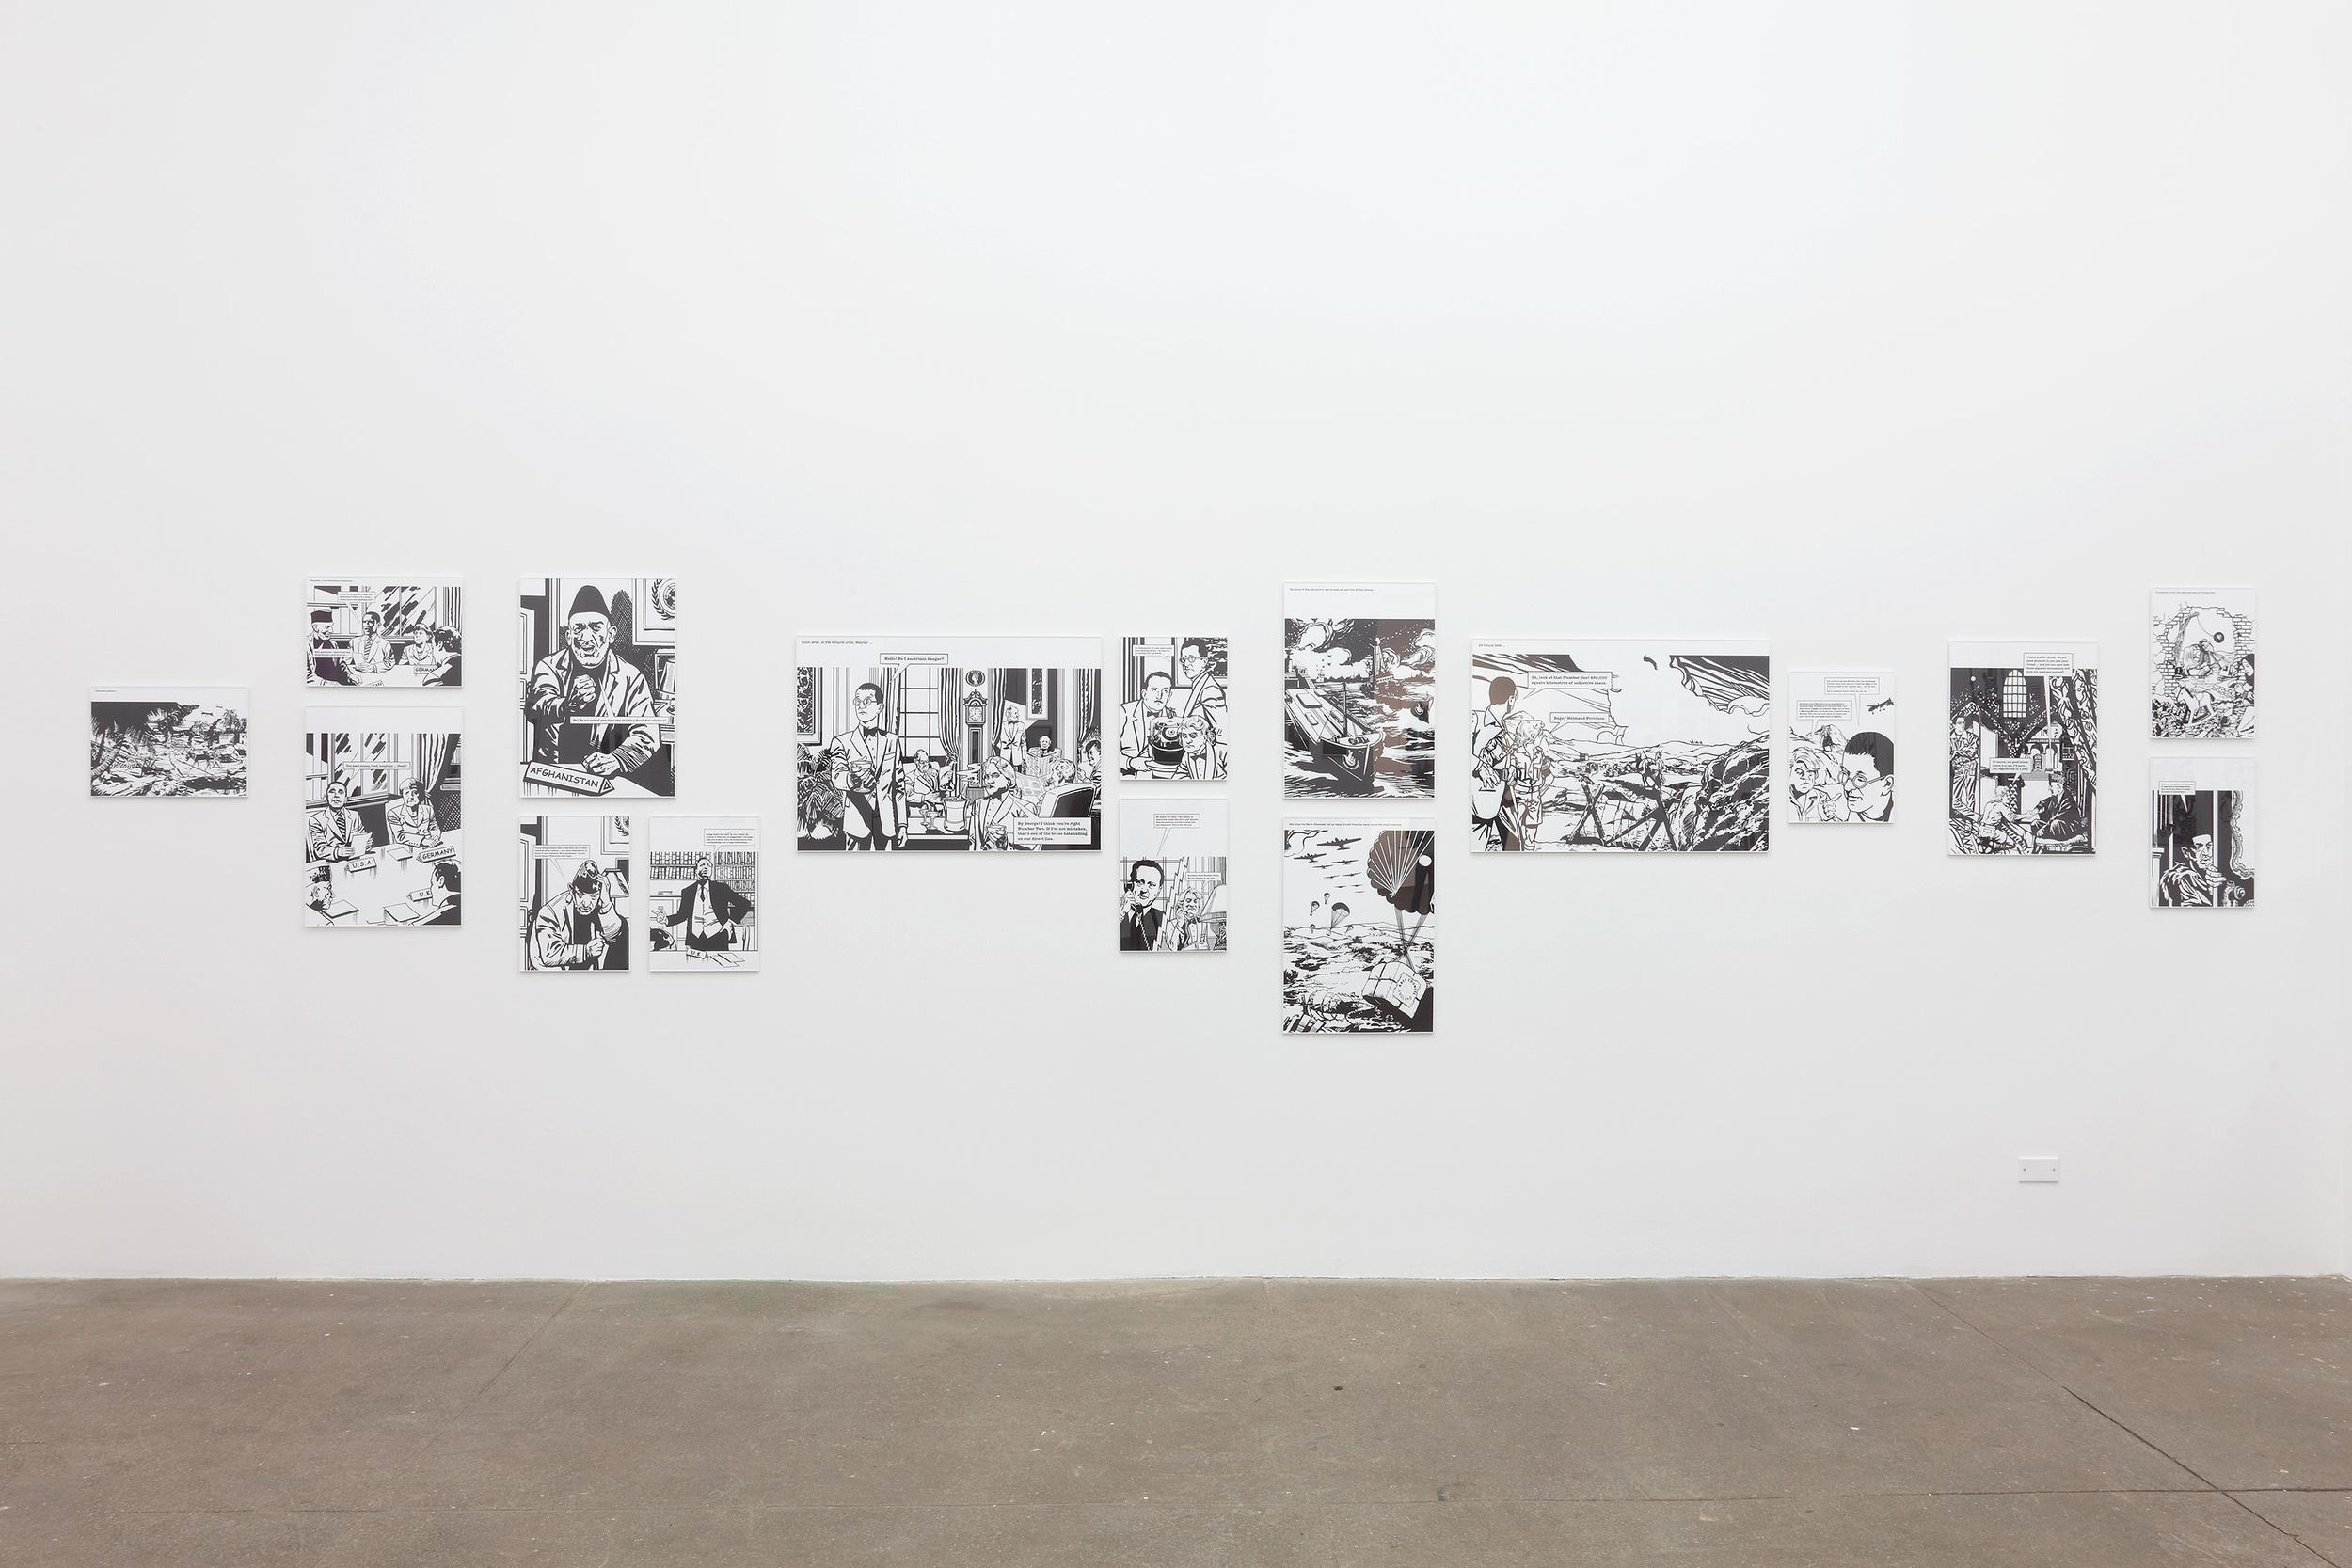 Anish and Antony Take Afghanistan 2014 Inkjet print on paper 32 parts: 10 x (44 x 62 cm / 17.3 x 24.4 in),14 x (34 x 44 cm / 13.3 x 17.3 in), 8 x (62 x 86 cm / 24.4 x 33.8 in) Ed. 1/2 + 1 AP